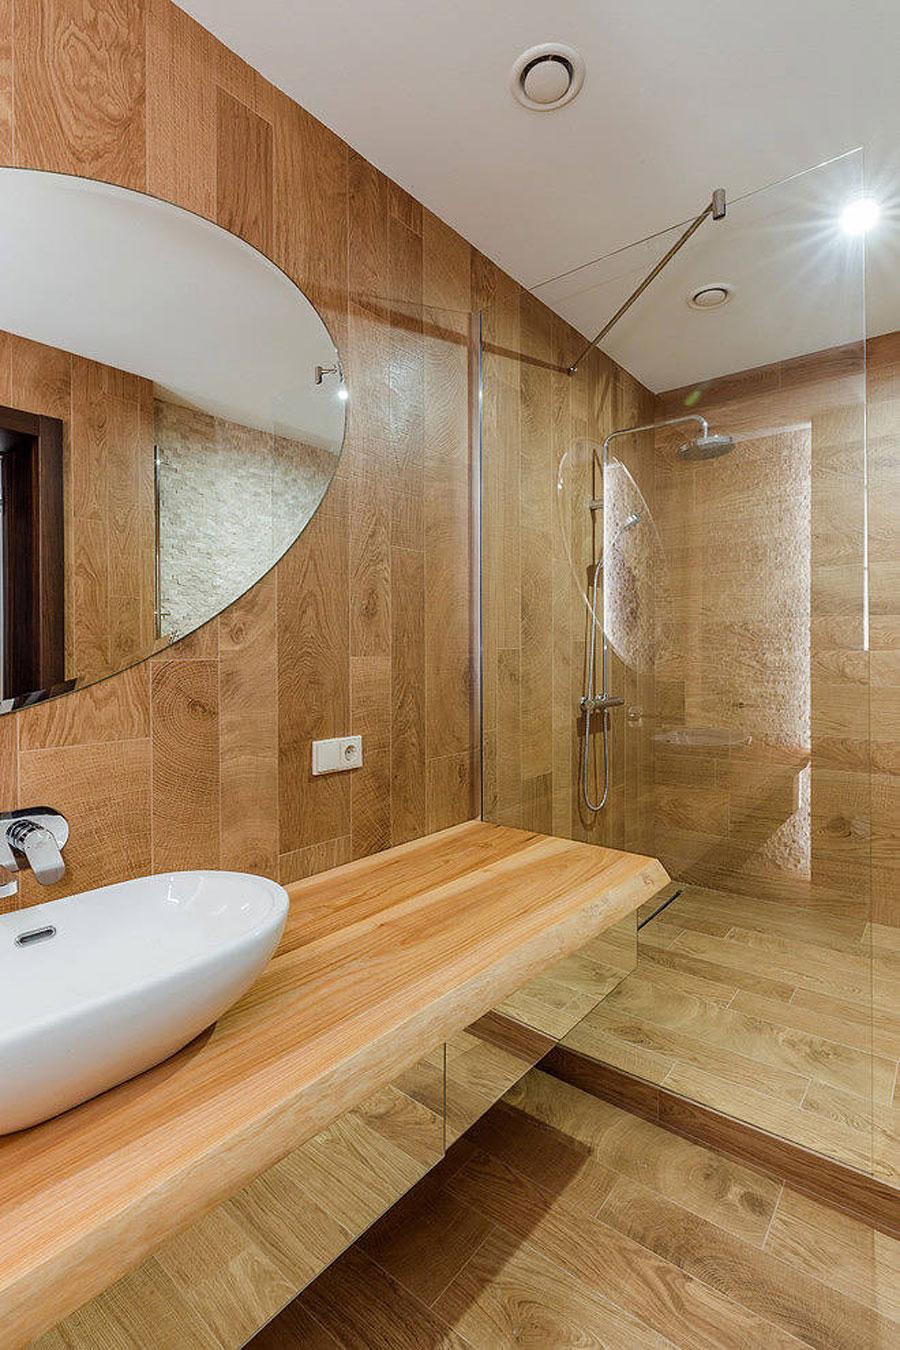 Luxe moderne rustieke badkamer met houtlook tegels